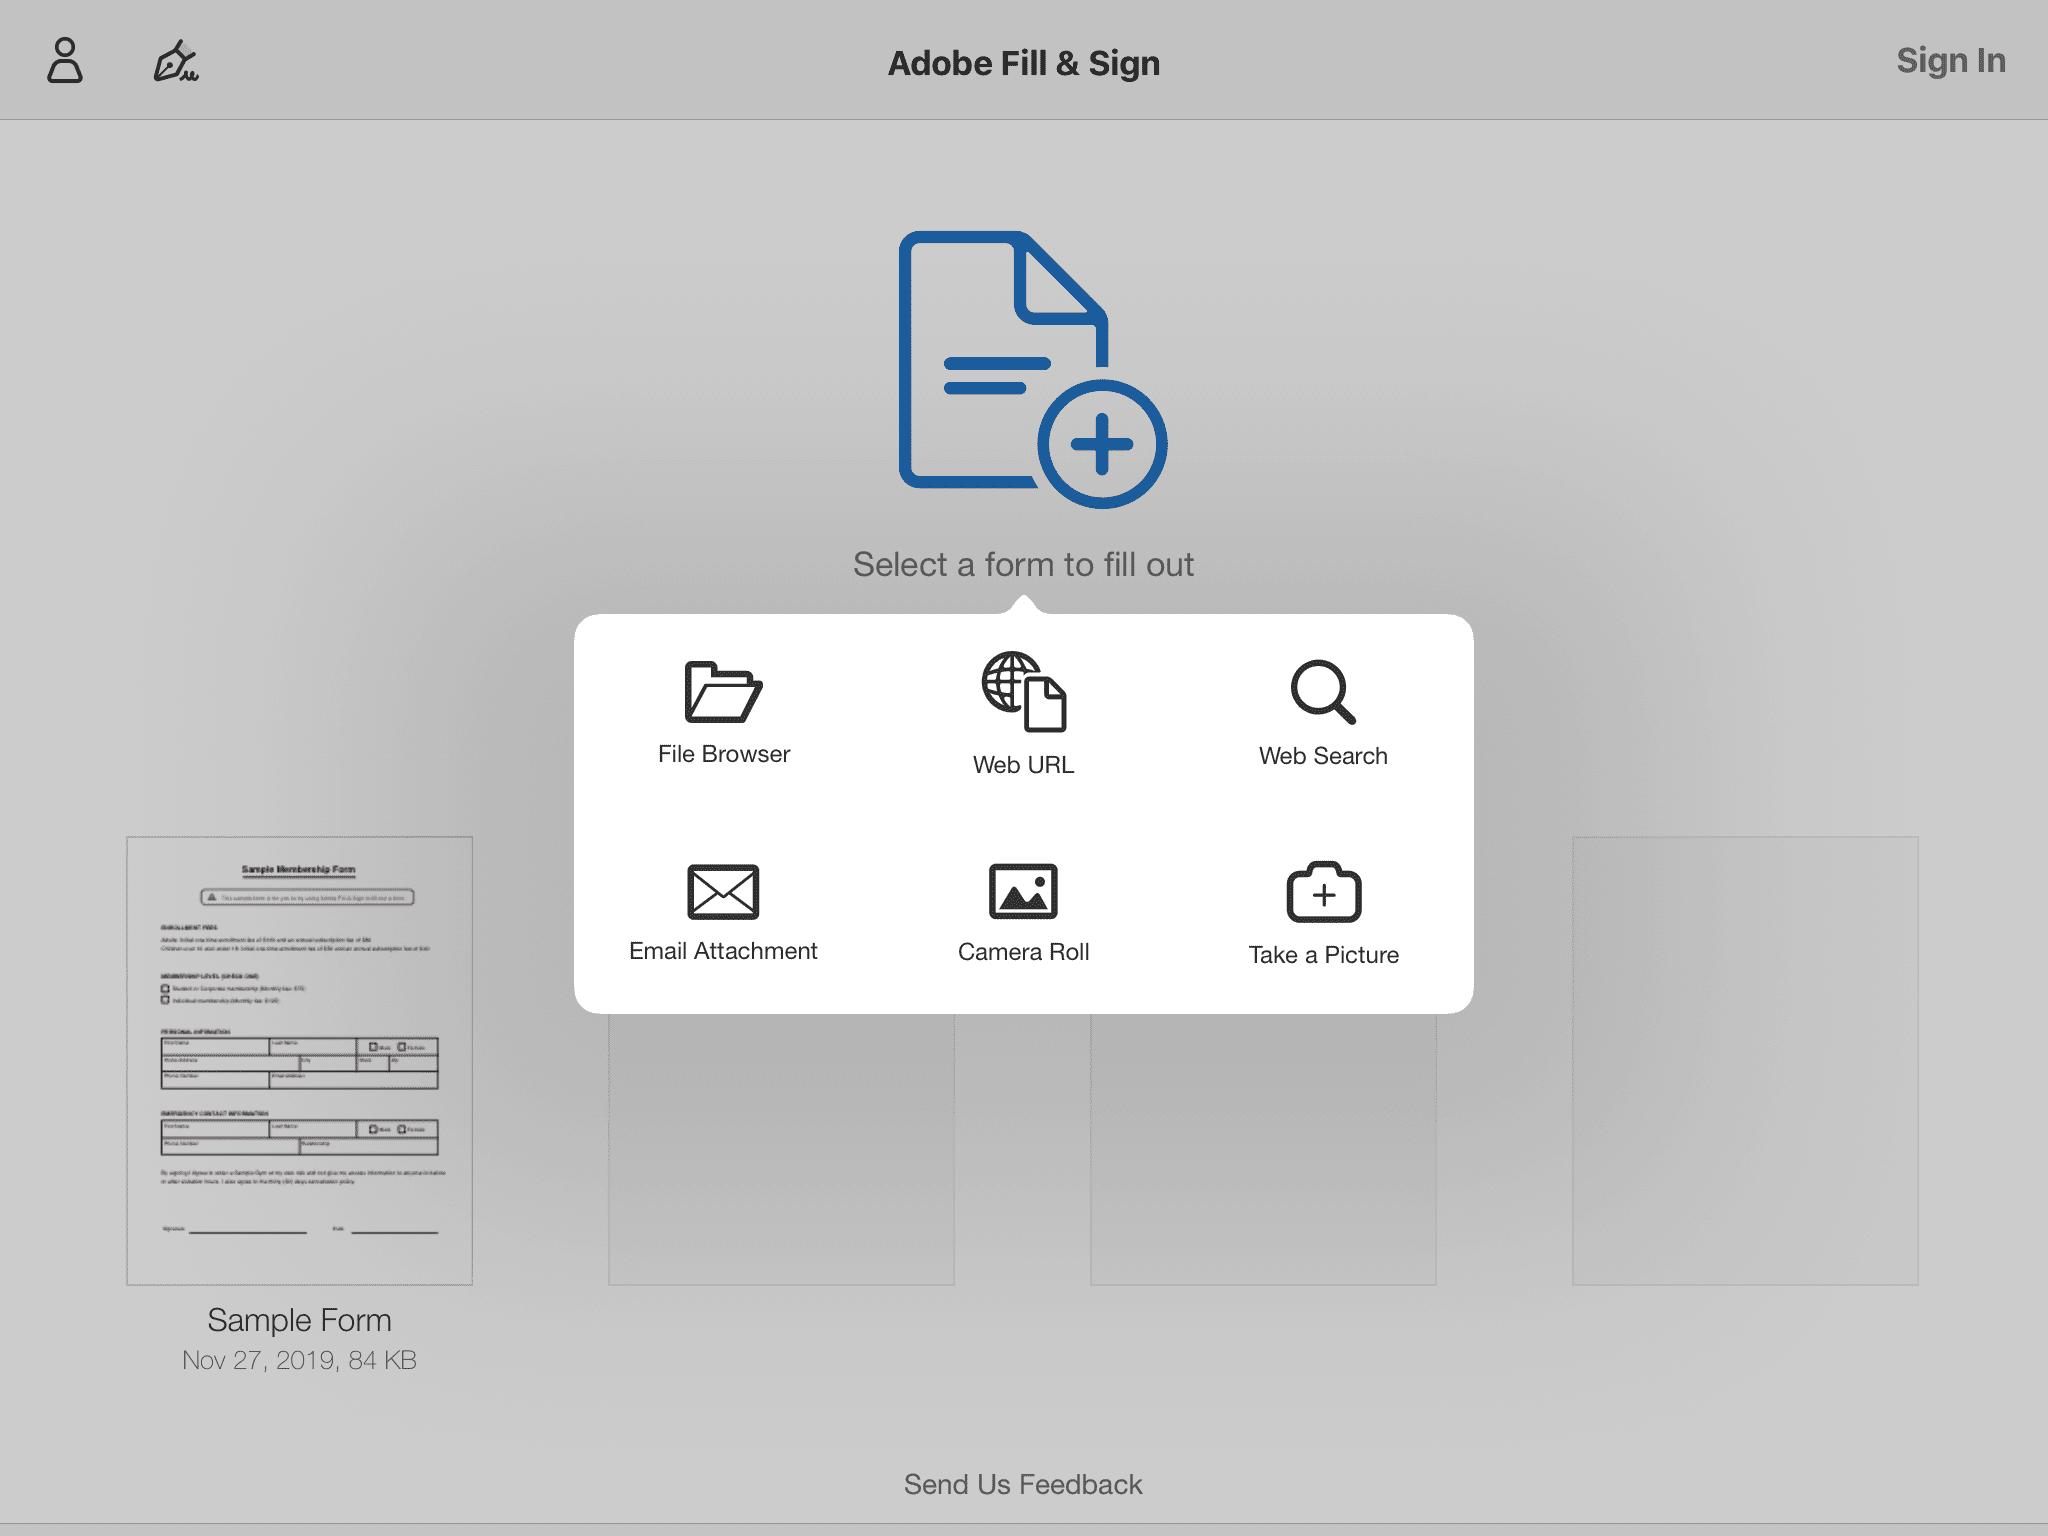 Finding a PDF inside Adobe Fill & Sign